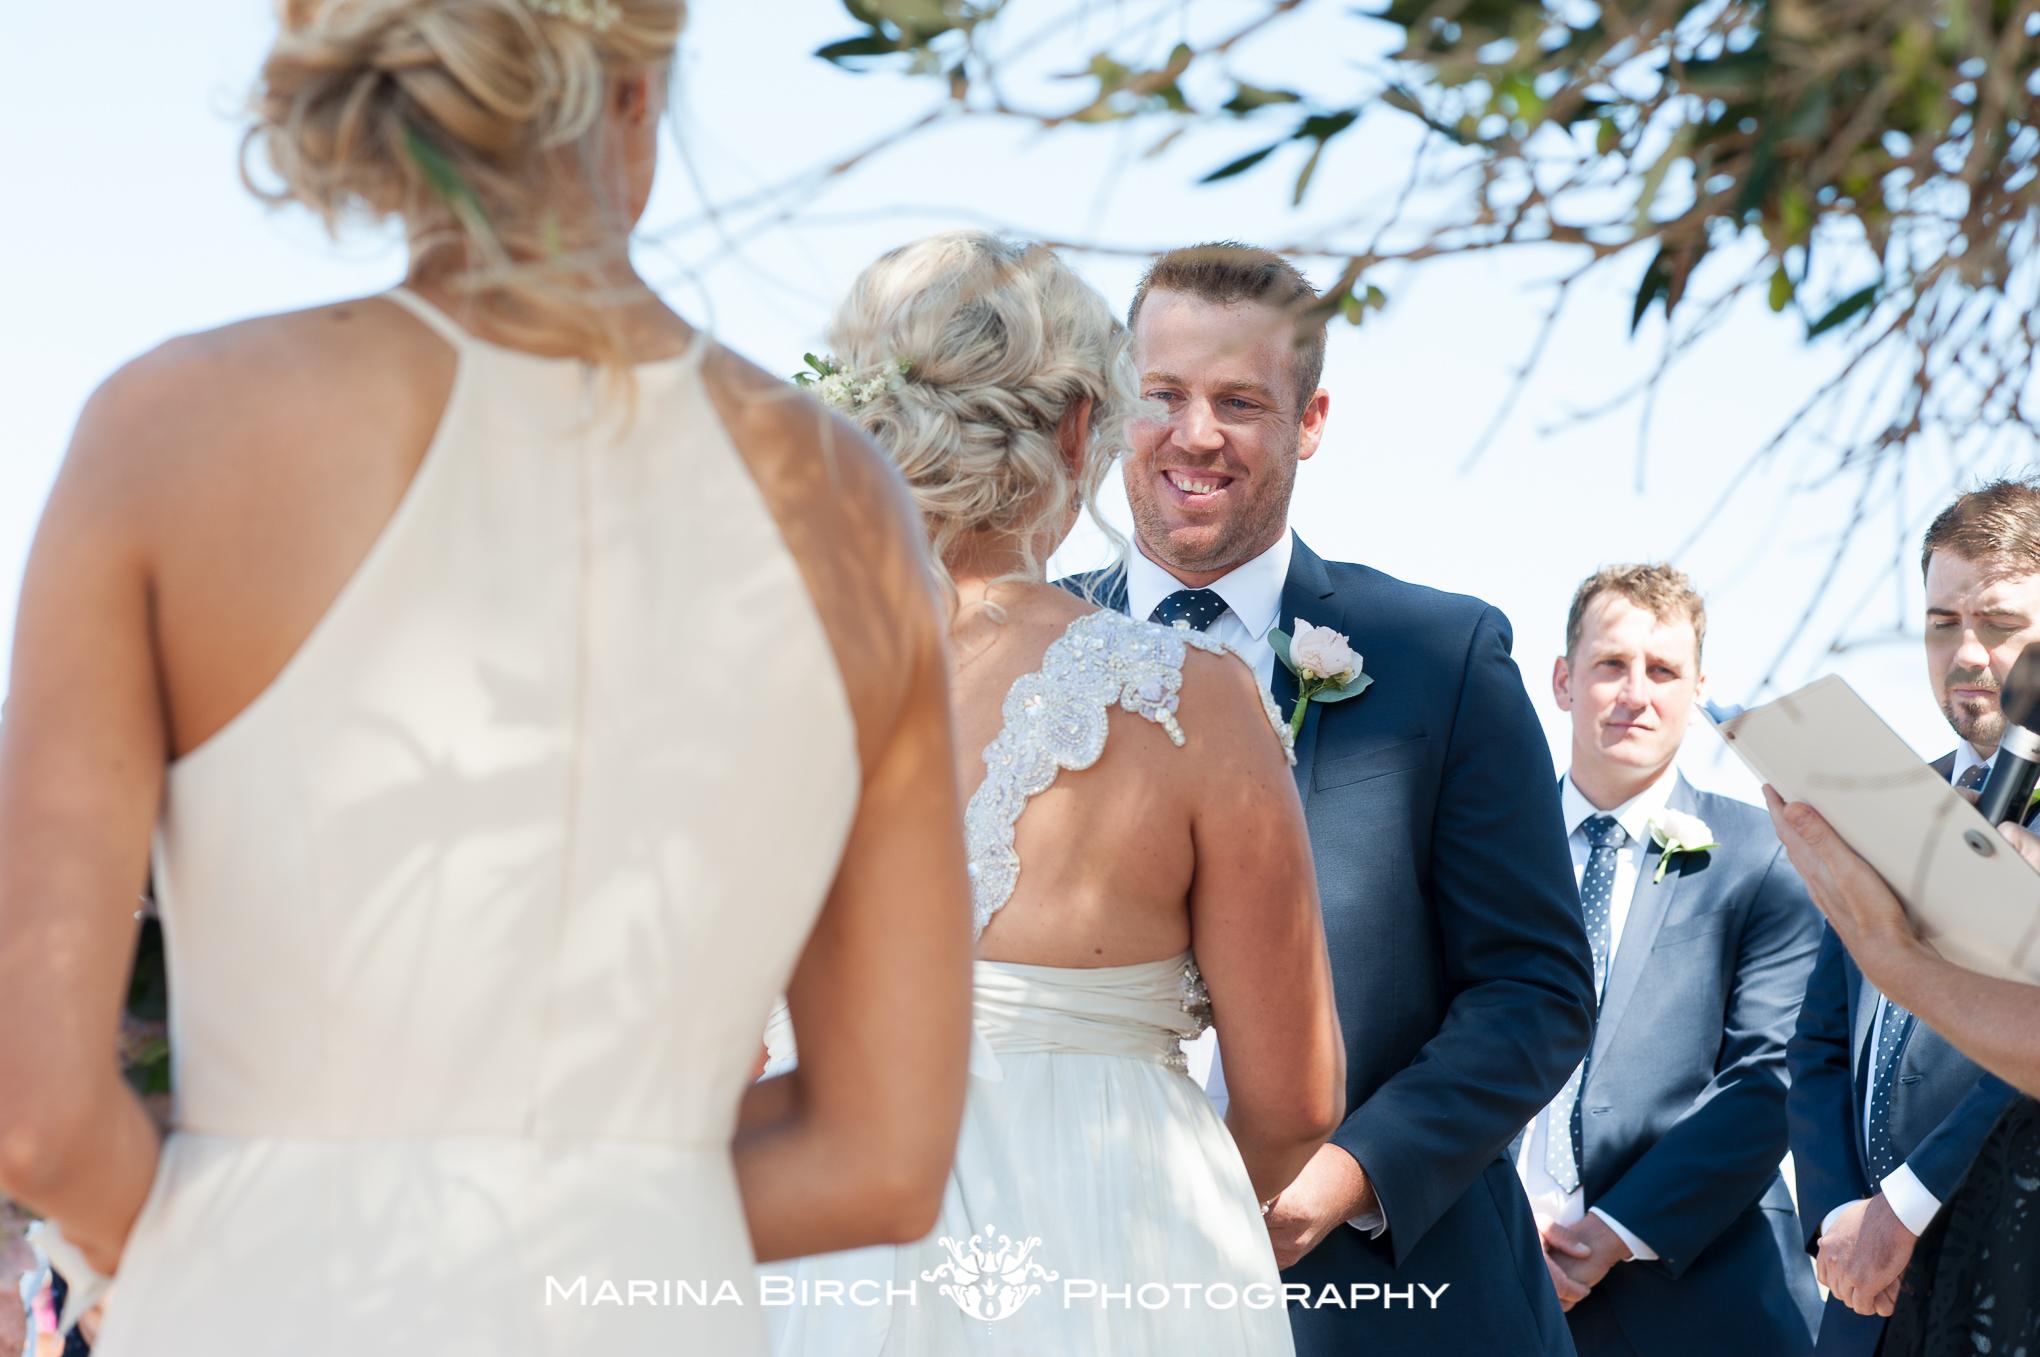 MBP.Parson's wedding-14.jpg